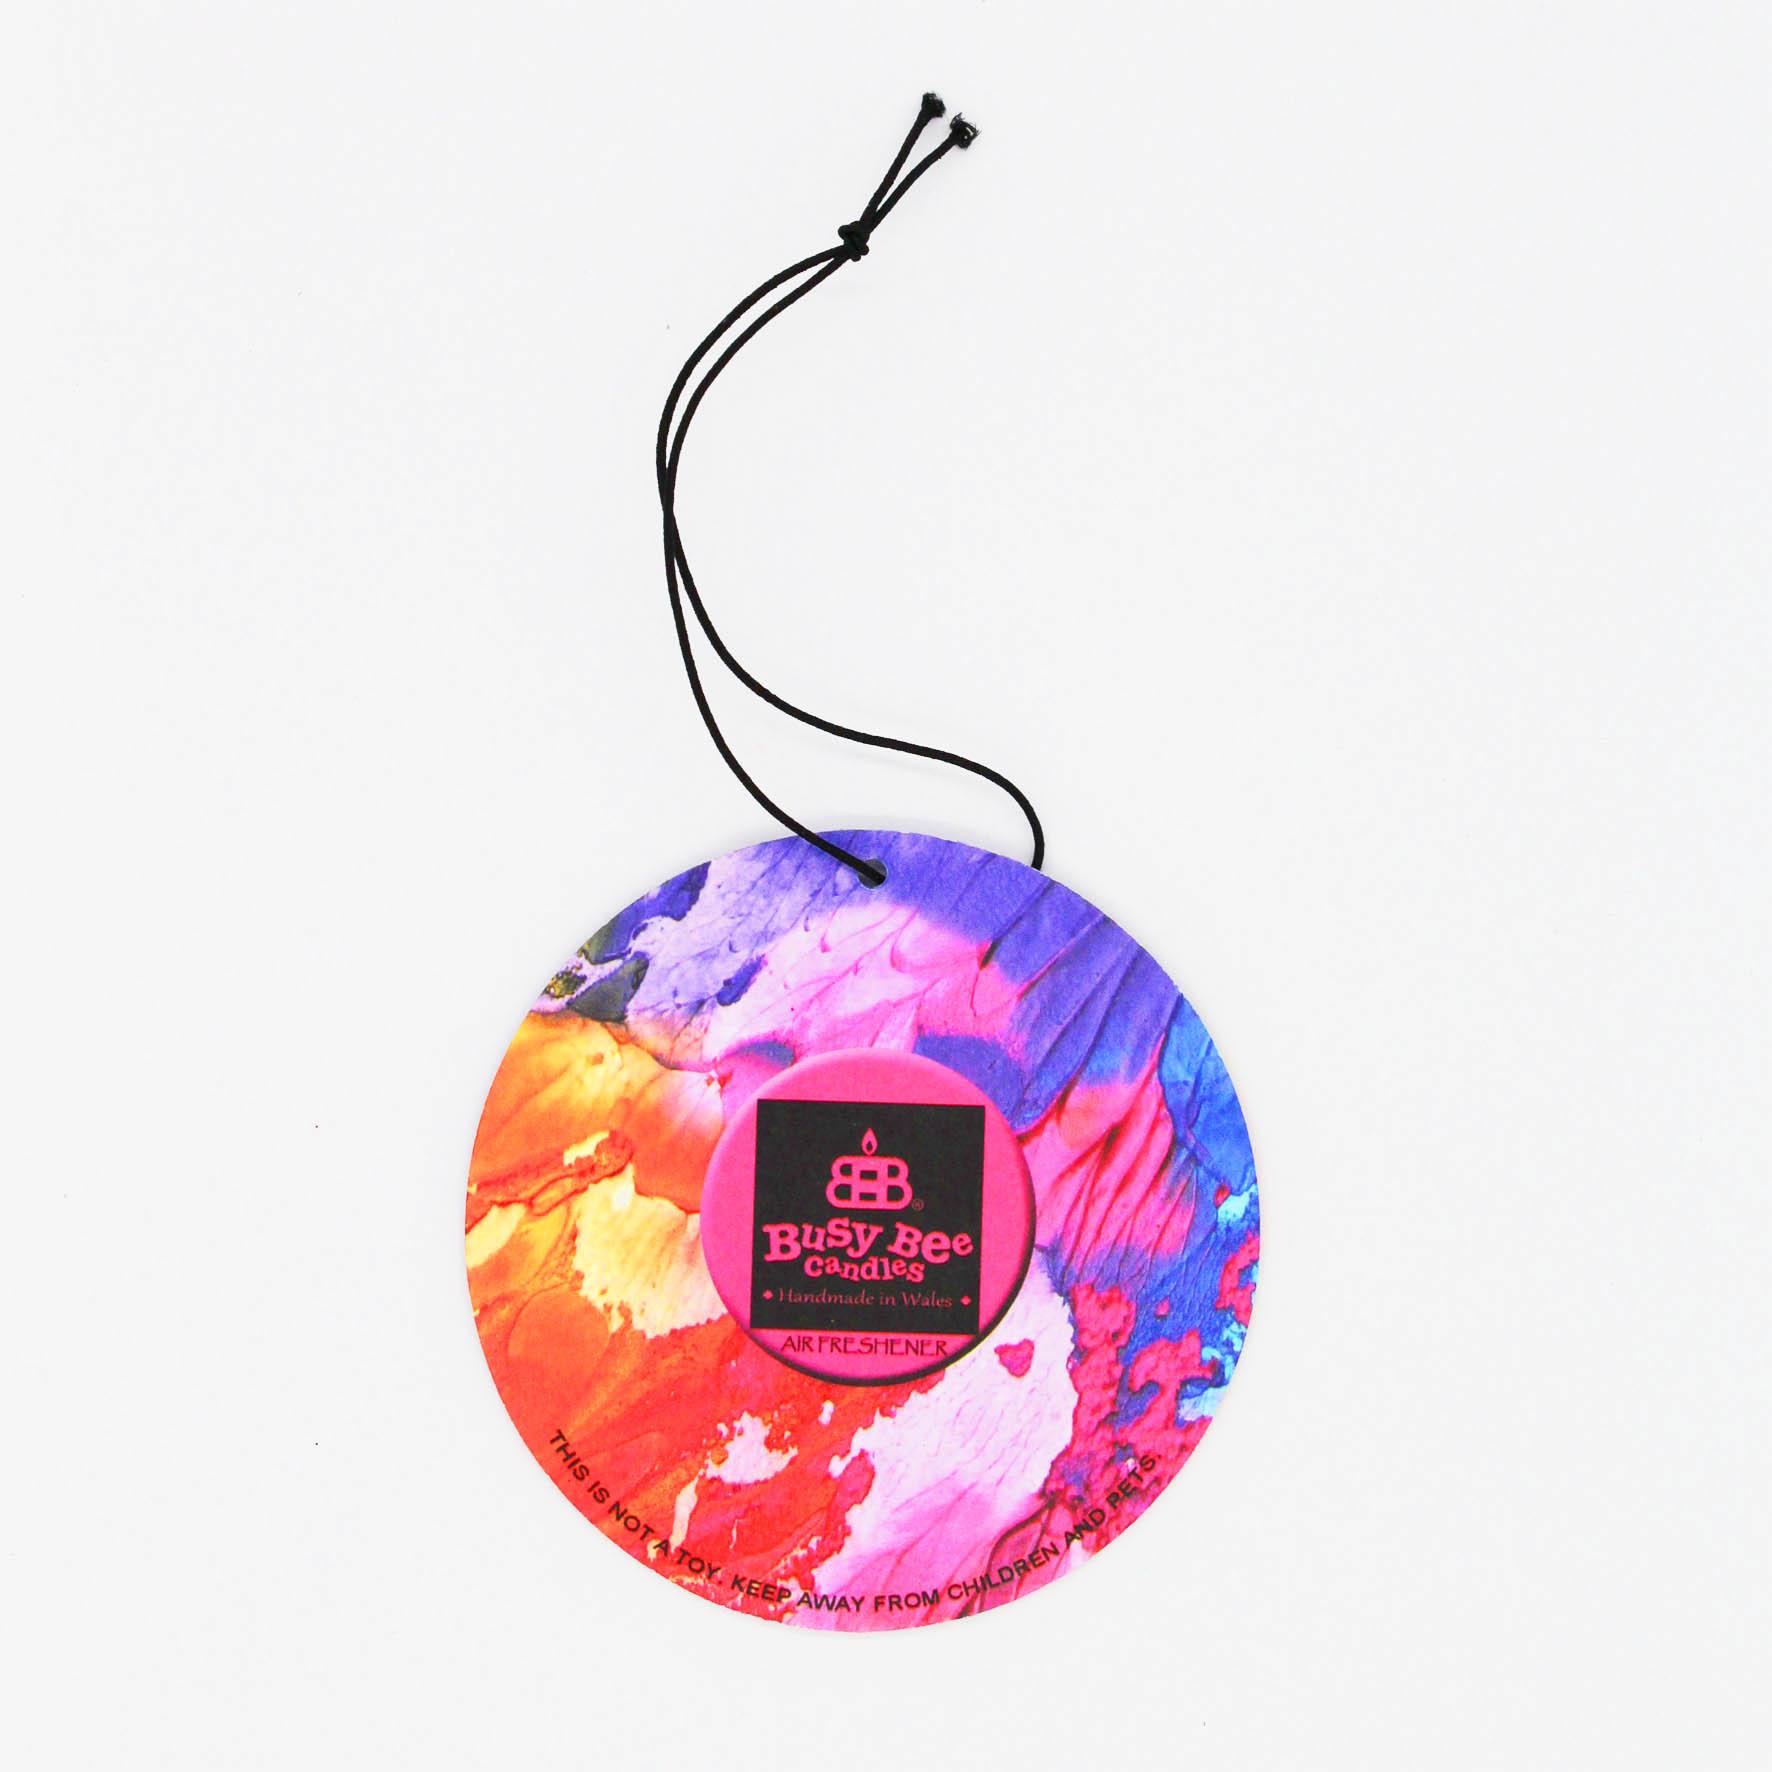 Seduction Hanging Air Freshener